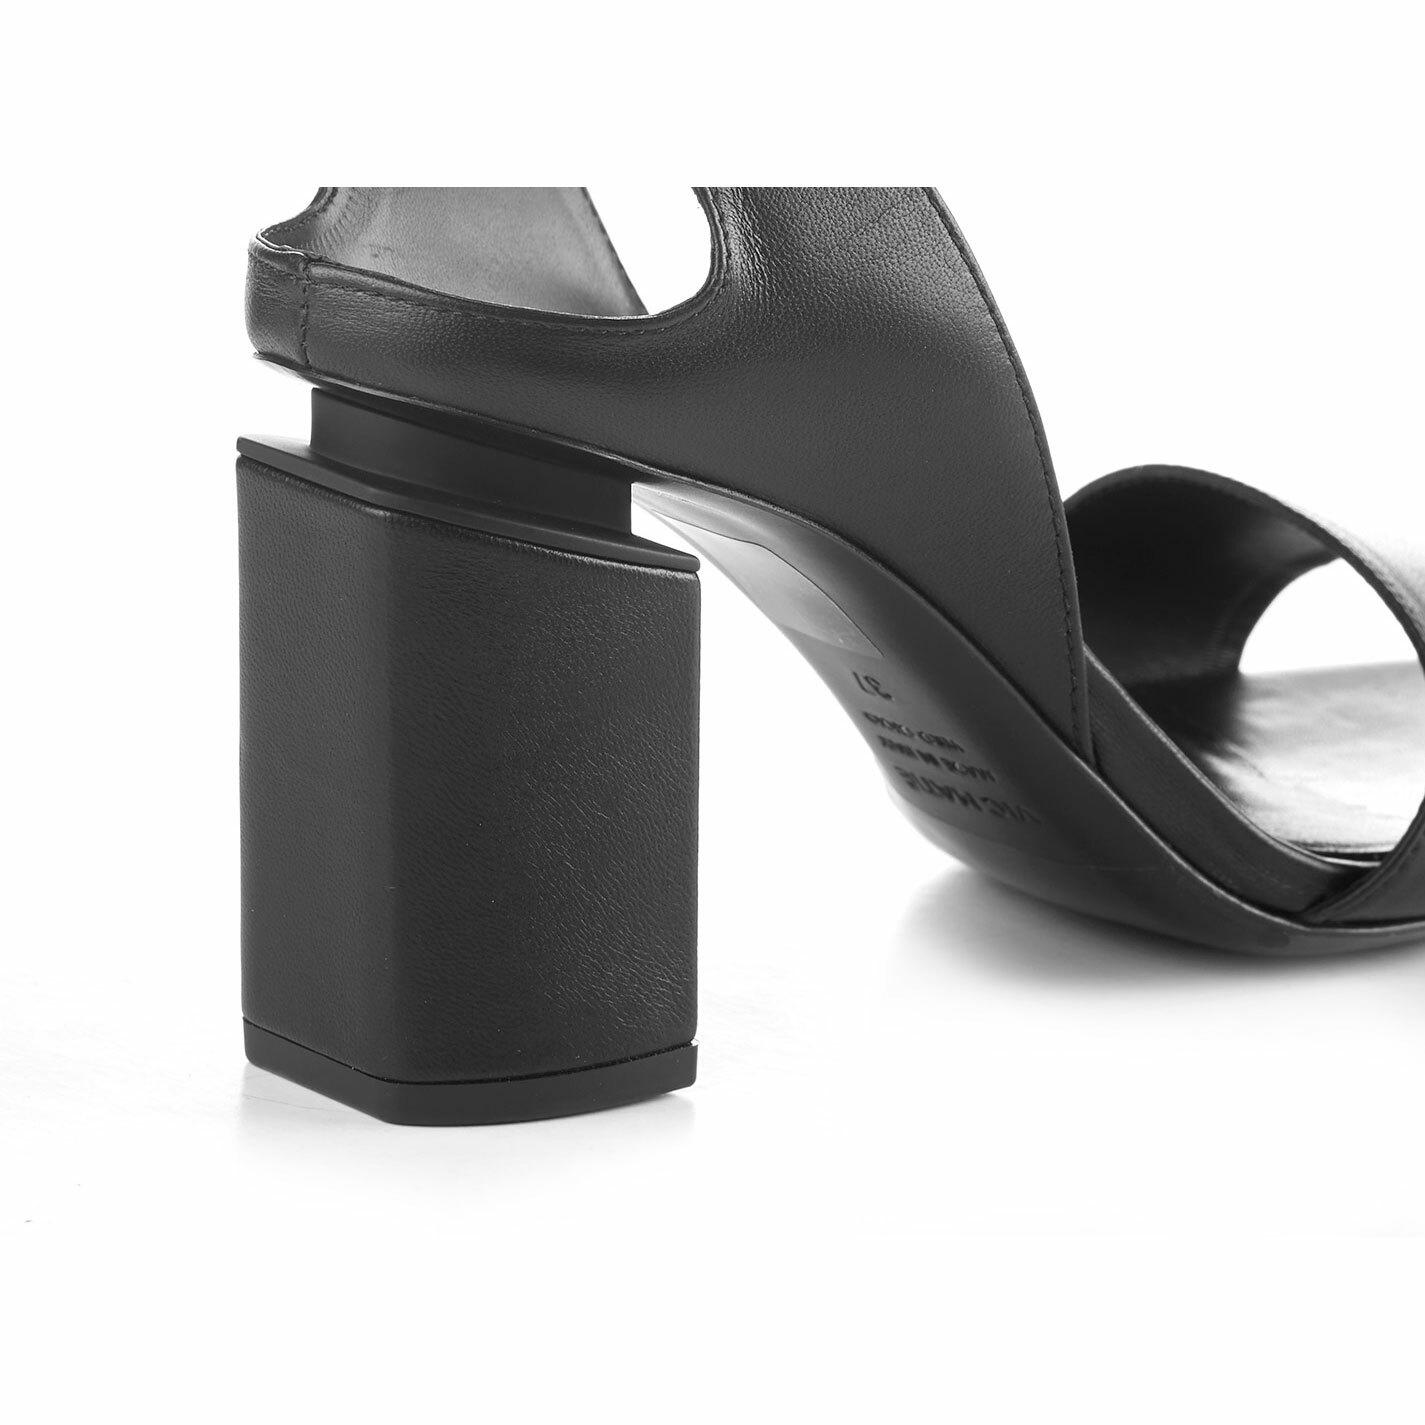 Black sandals with suspended heel